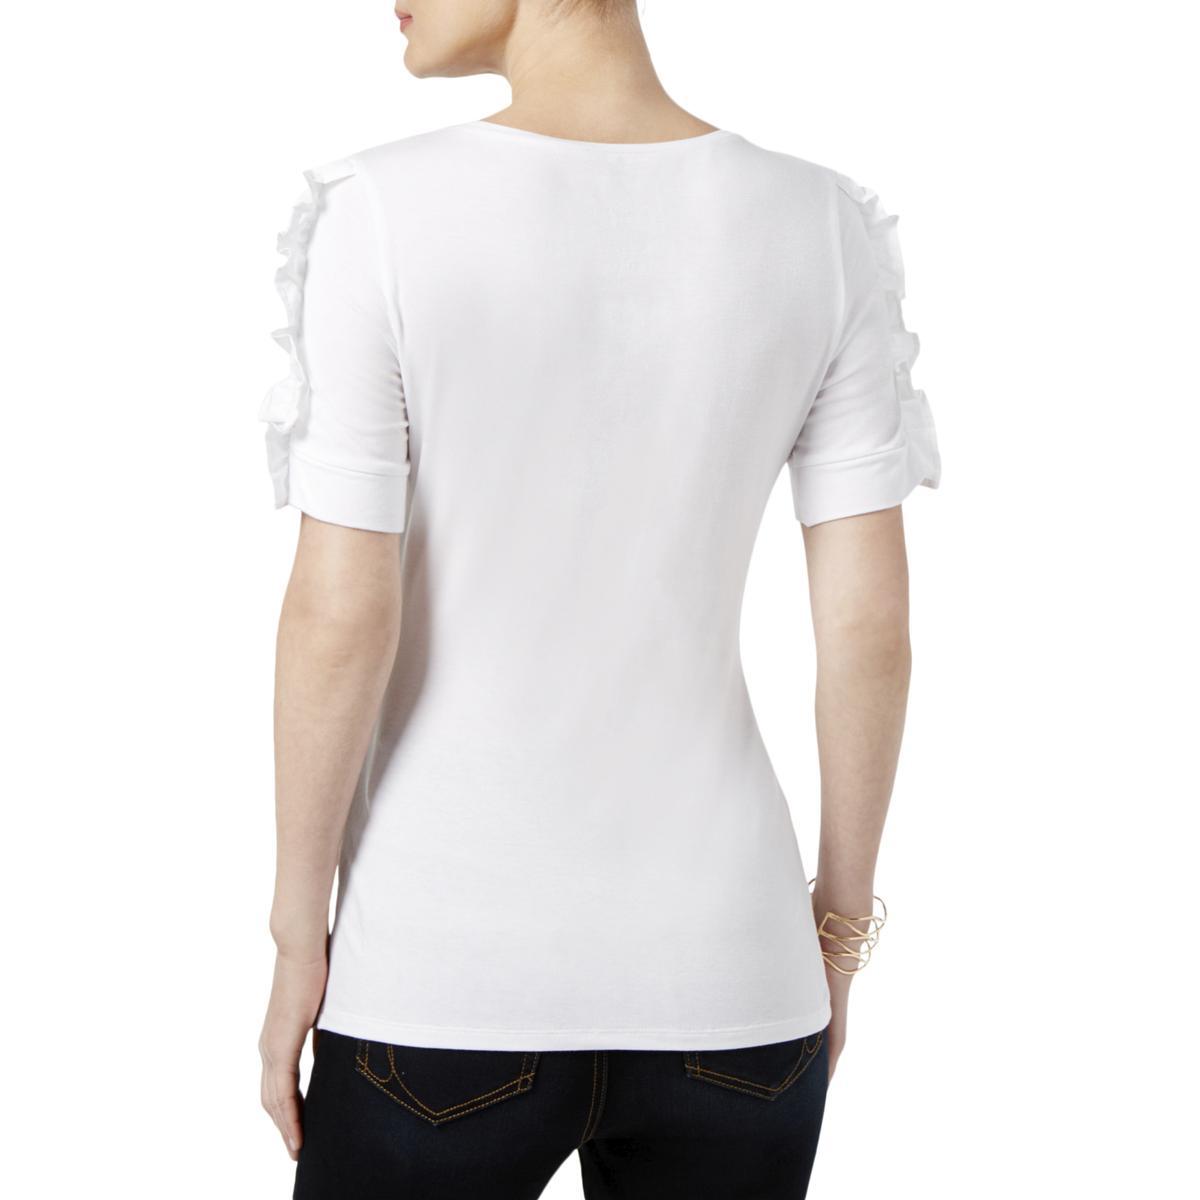 INC-Womens-Ruffled-Short-Sleeves-Scoop-Neck-Casual-Top-Shirt-BHFO-3817